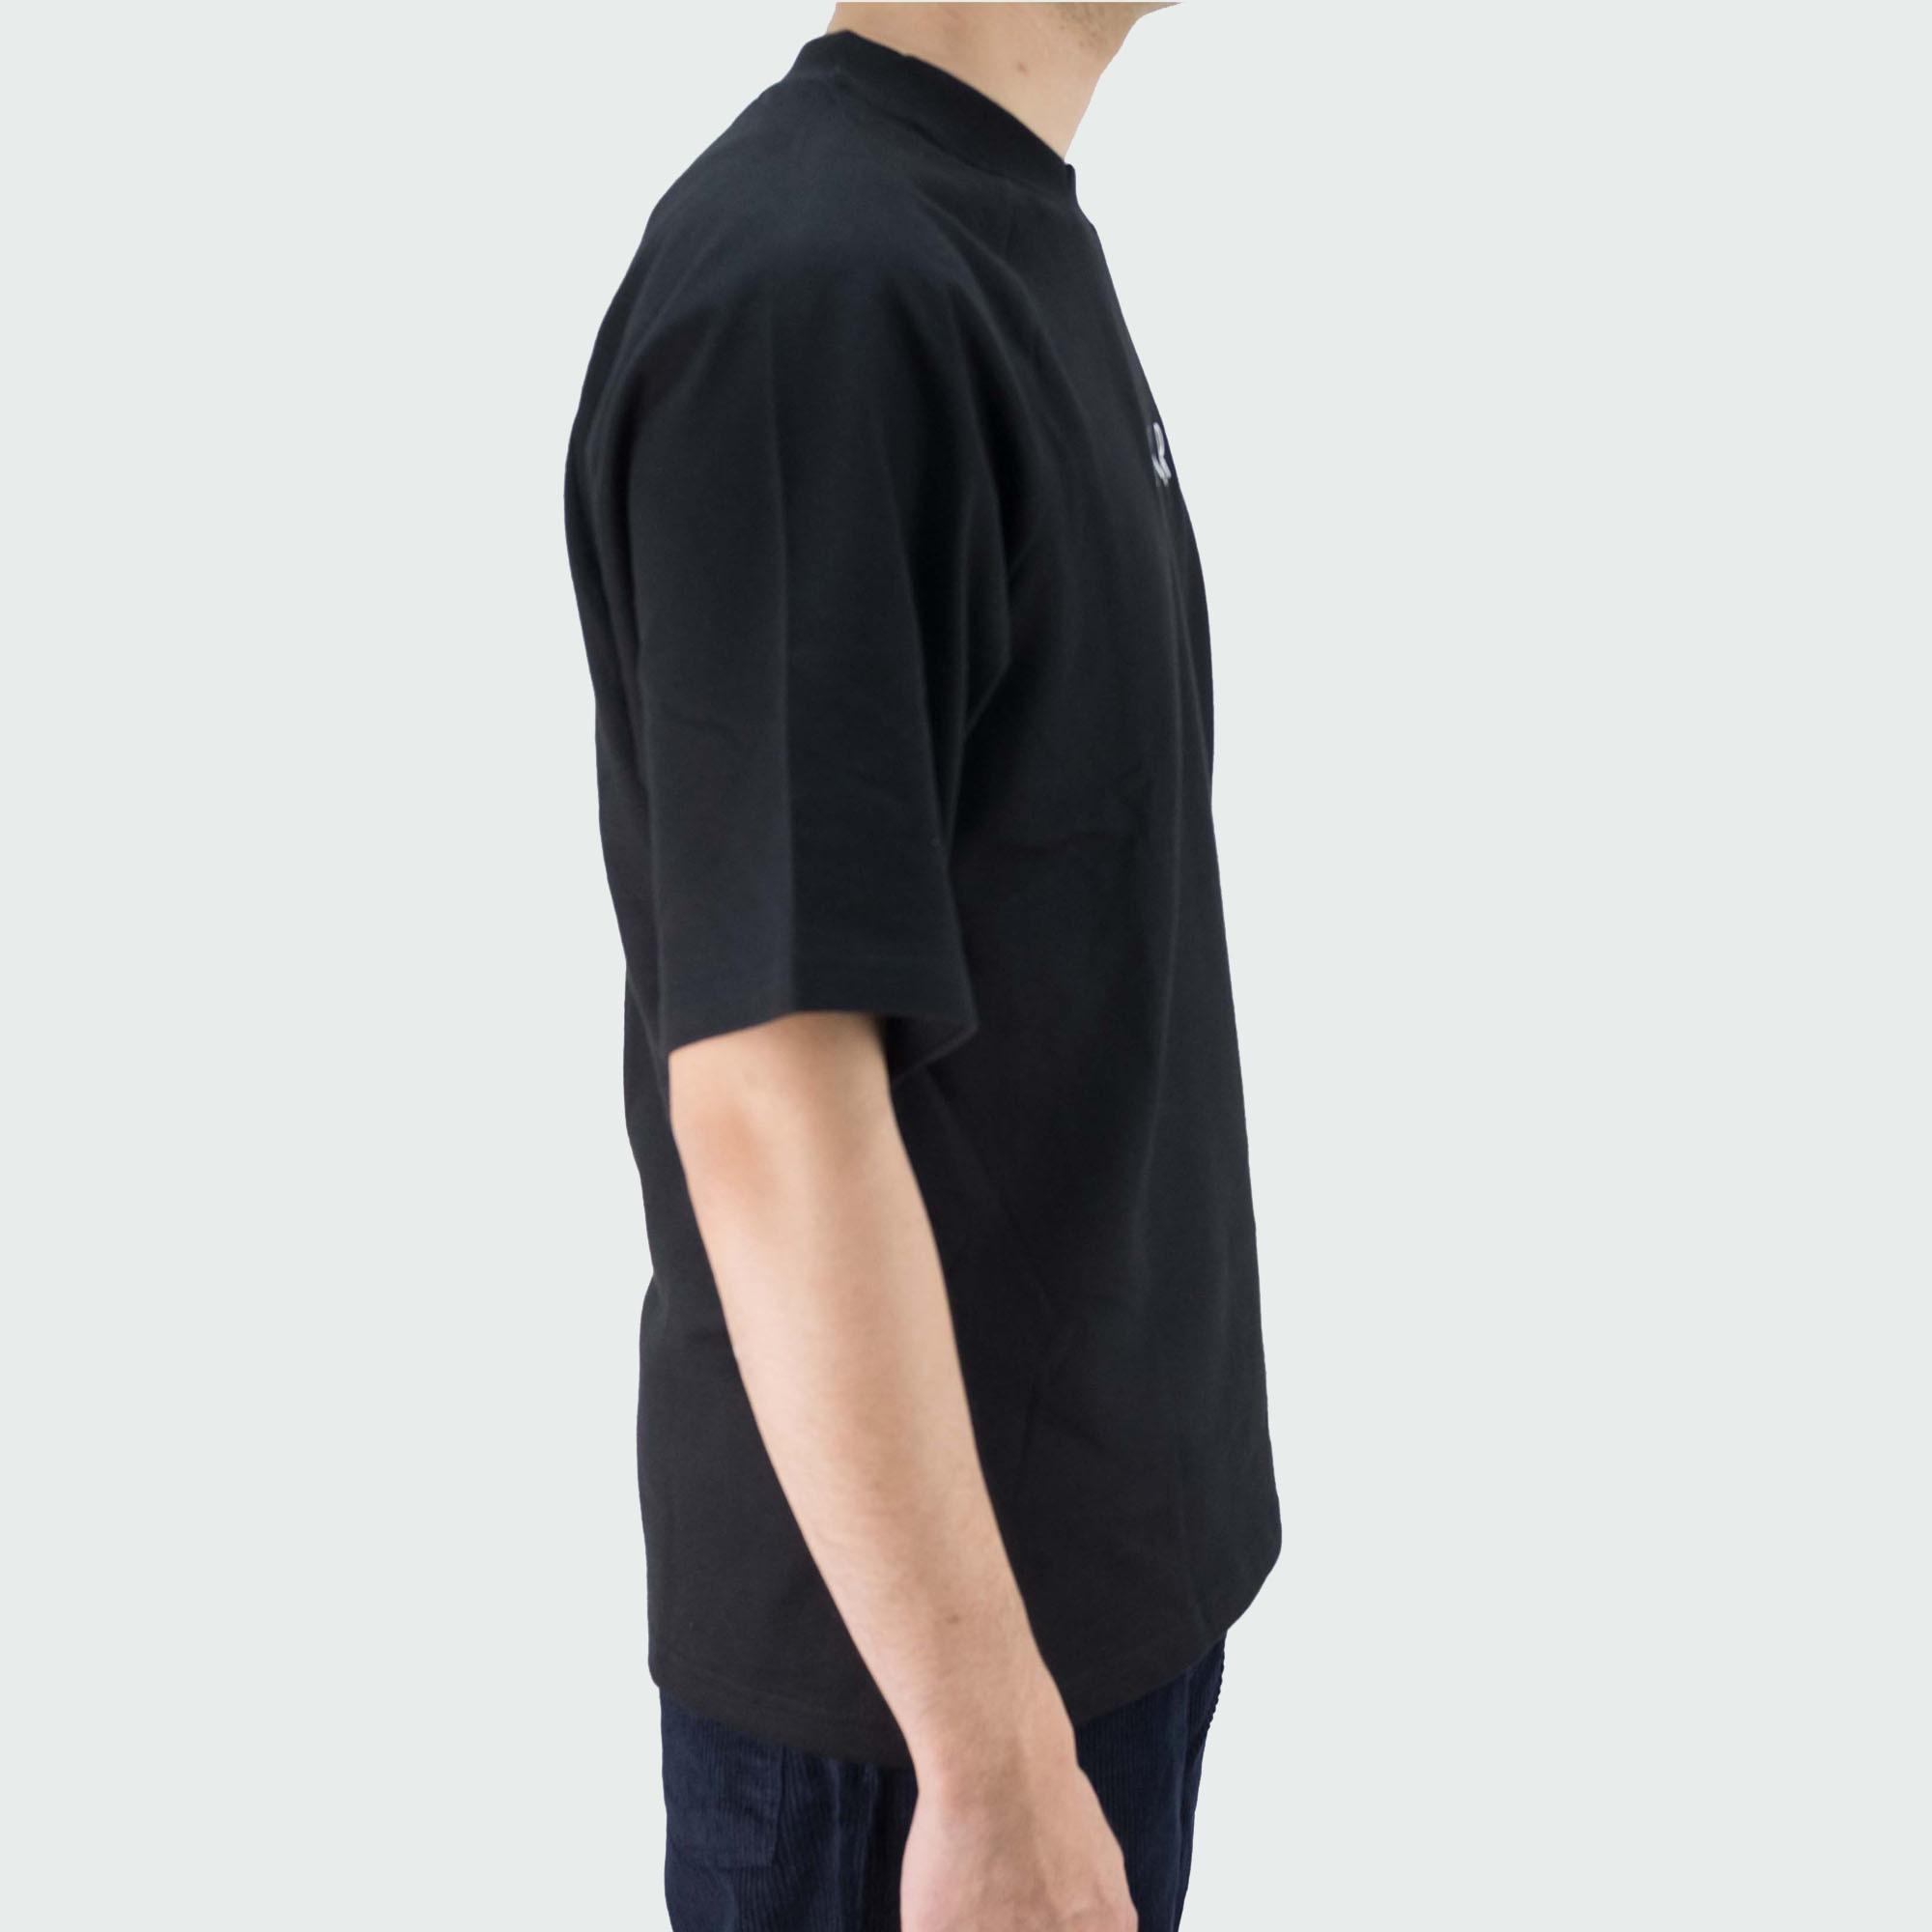 Polar Skate Co. Default T Shirt - Black